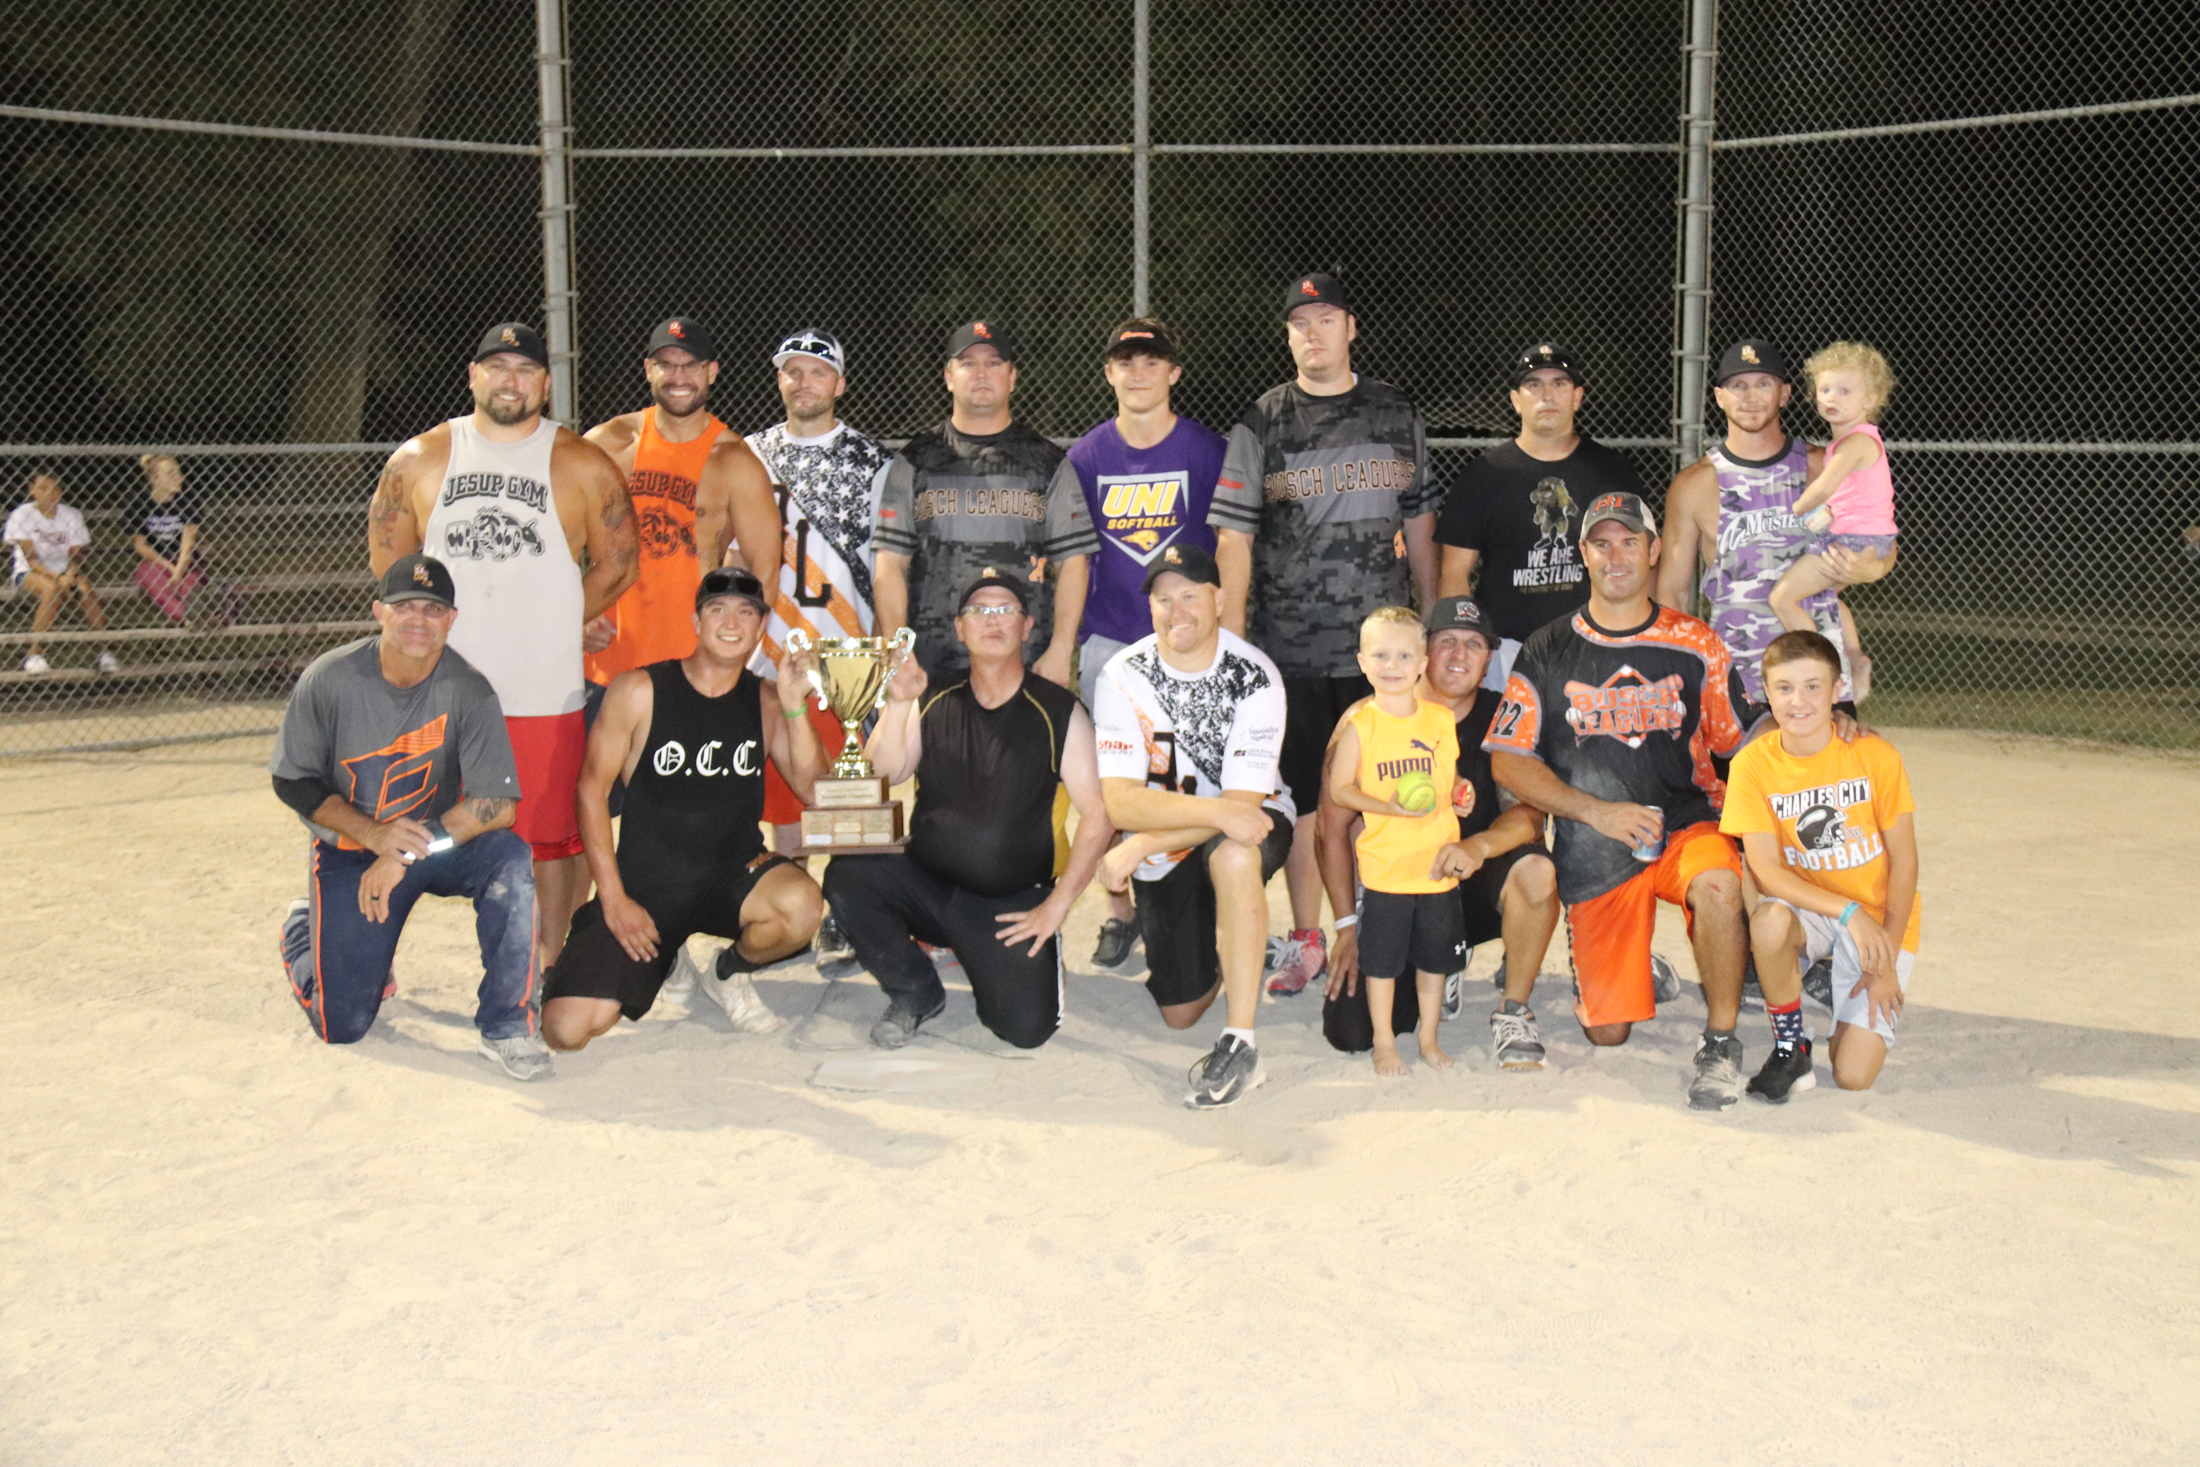 Busch Leaguers best Empire for CC Adult Softball League championship cup